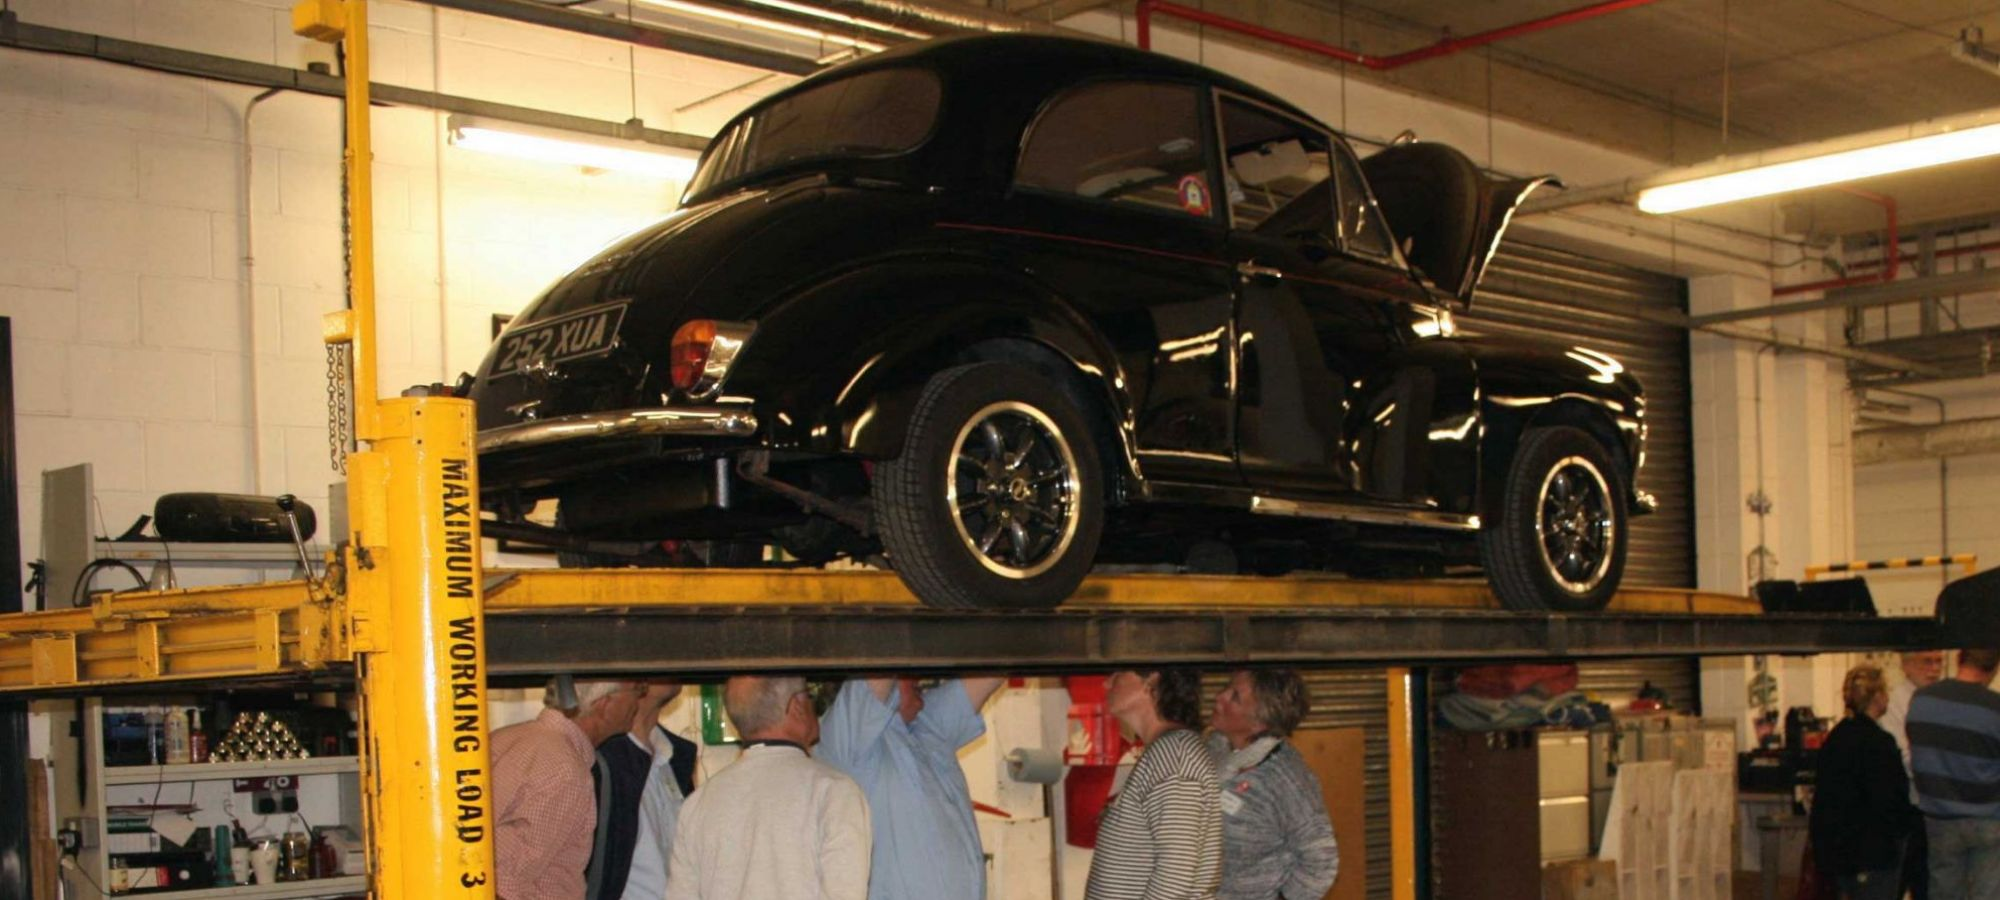 British Motor Museum Banbury Road Gaydon Warwickshire CV35 0BJ